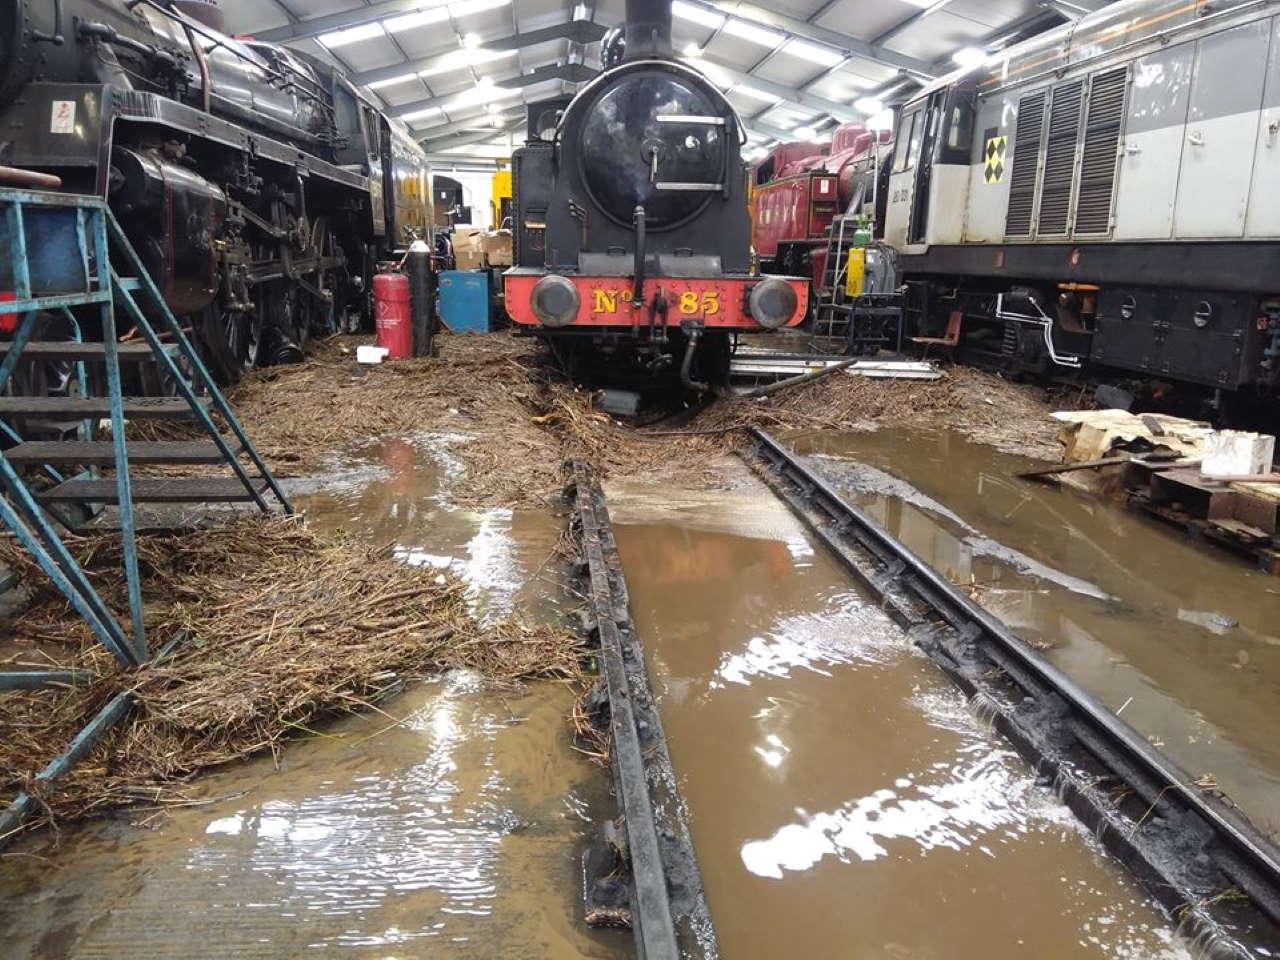 Storm Ciara Flood damage inside Haworth locomotive shed